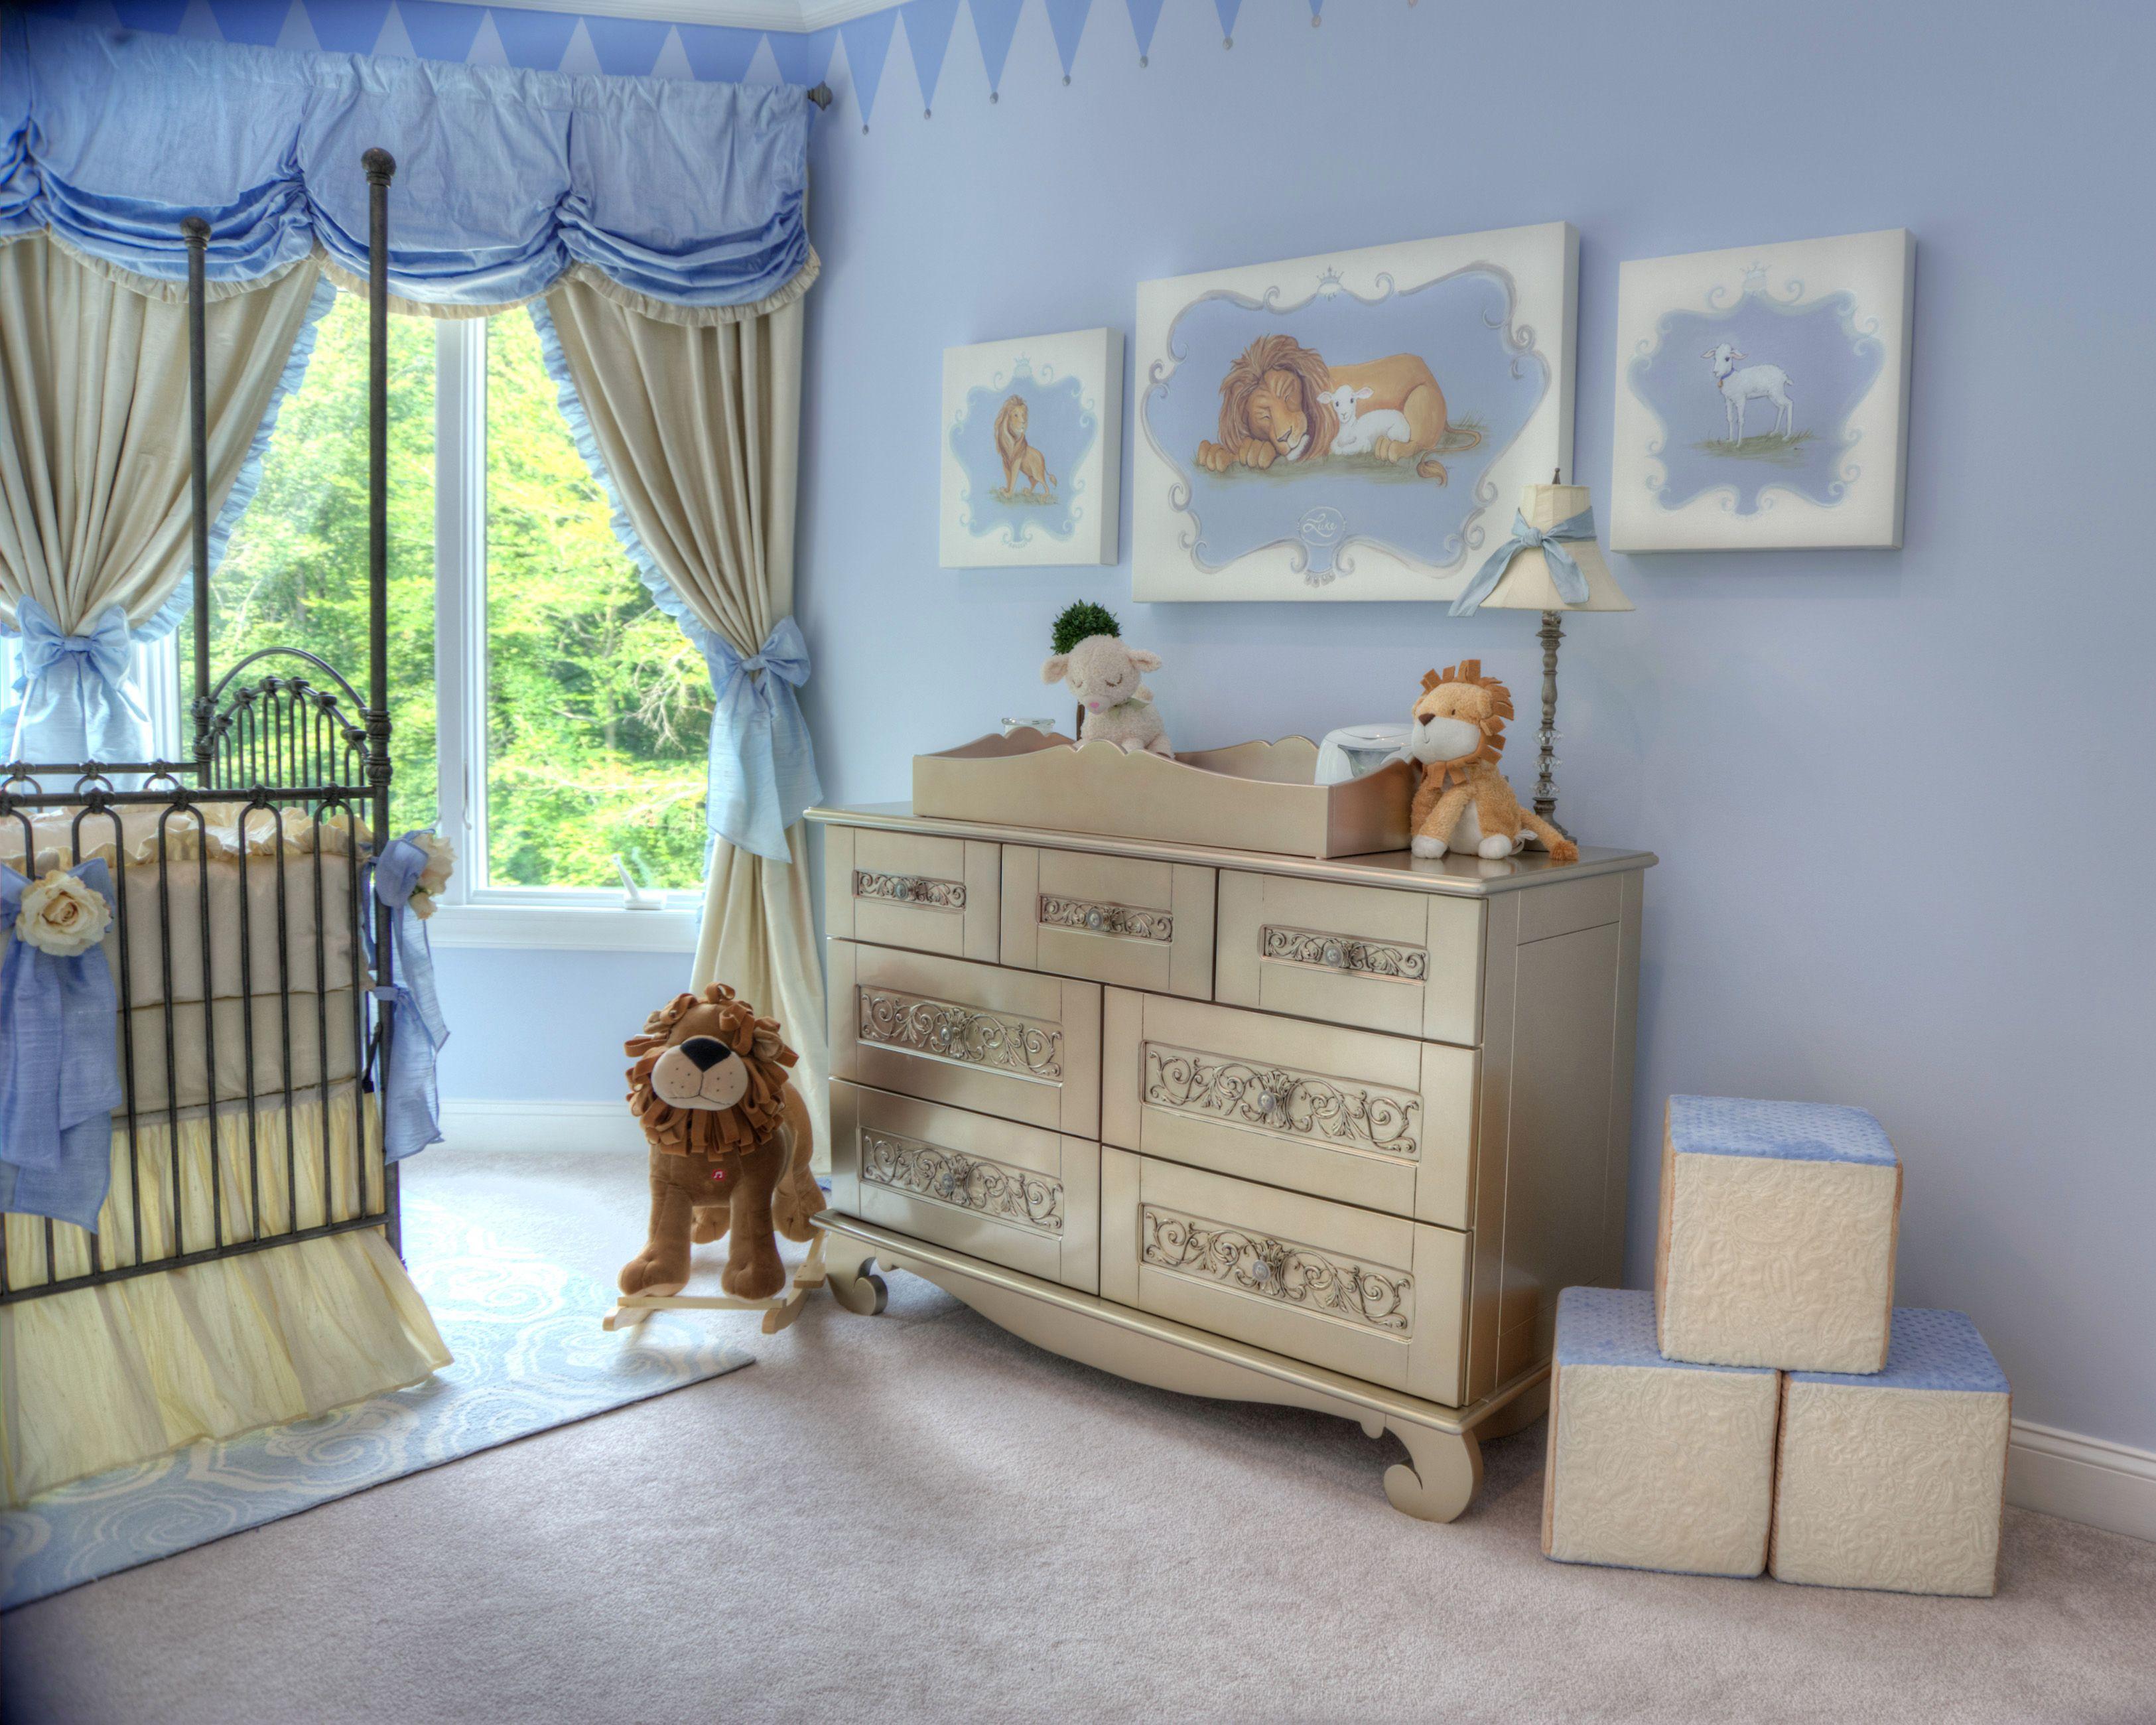 Nursery Design Trends Advice From Celebrity Designer: Royal Prince Nursery, Prince Design Ideas, Royal Baby